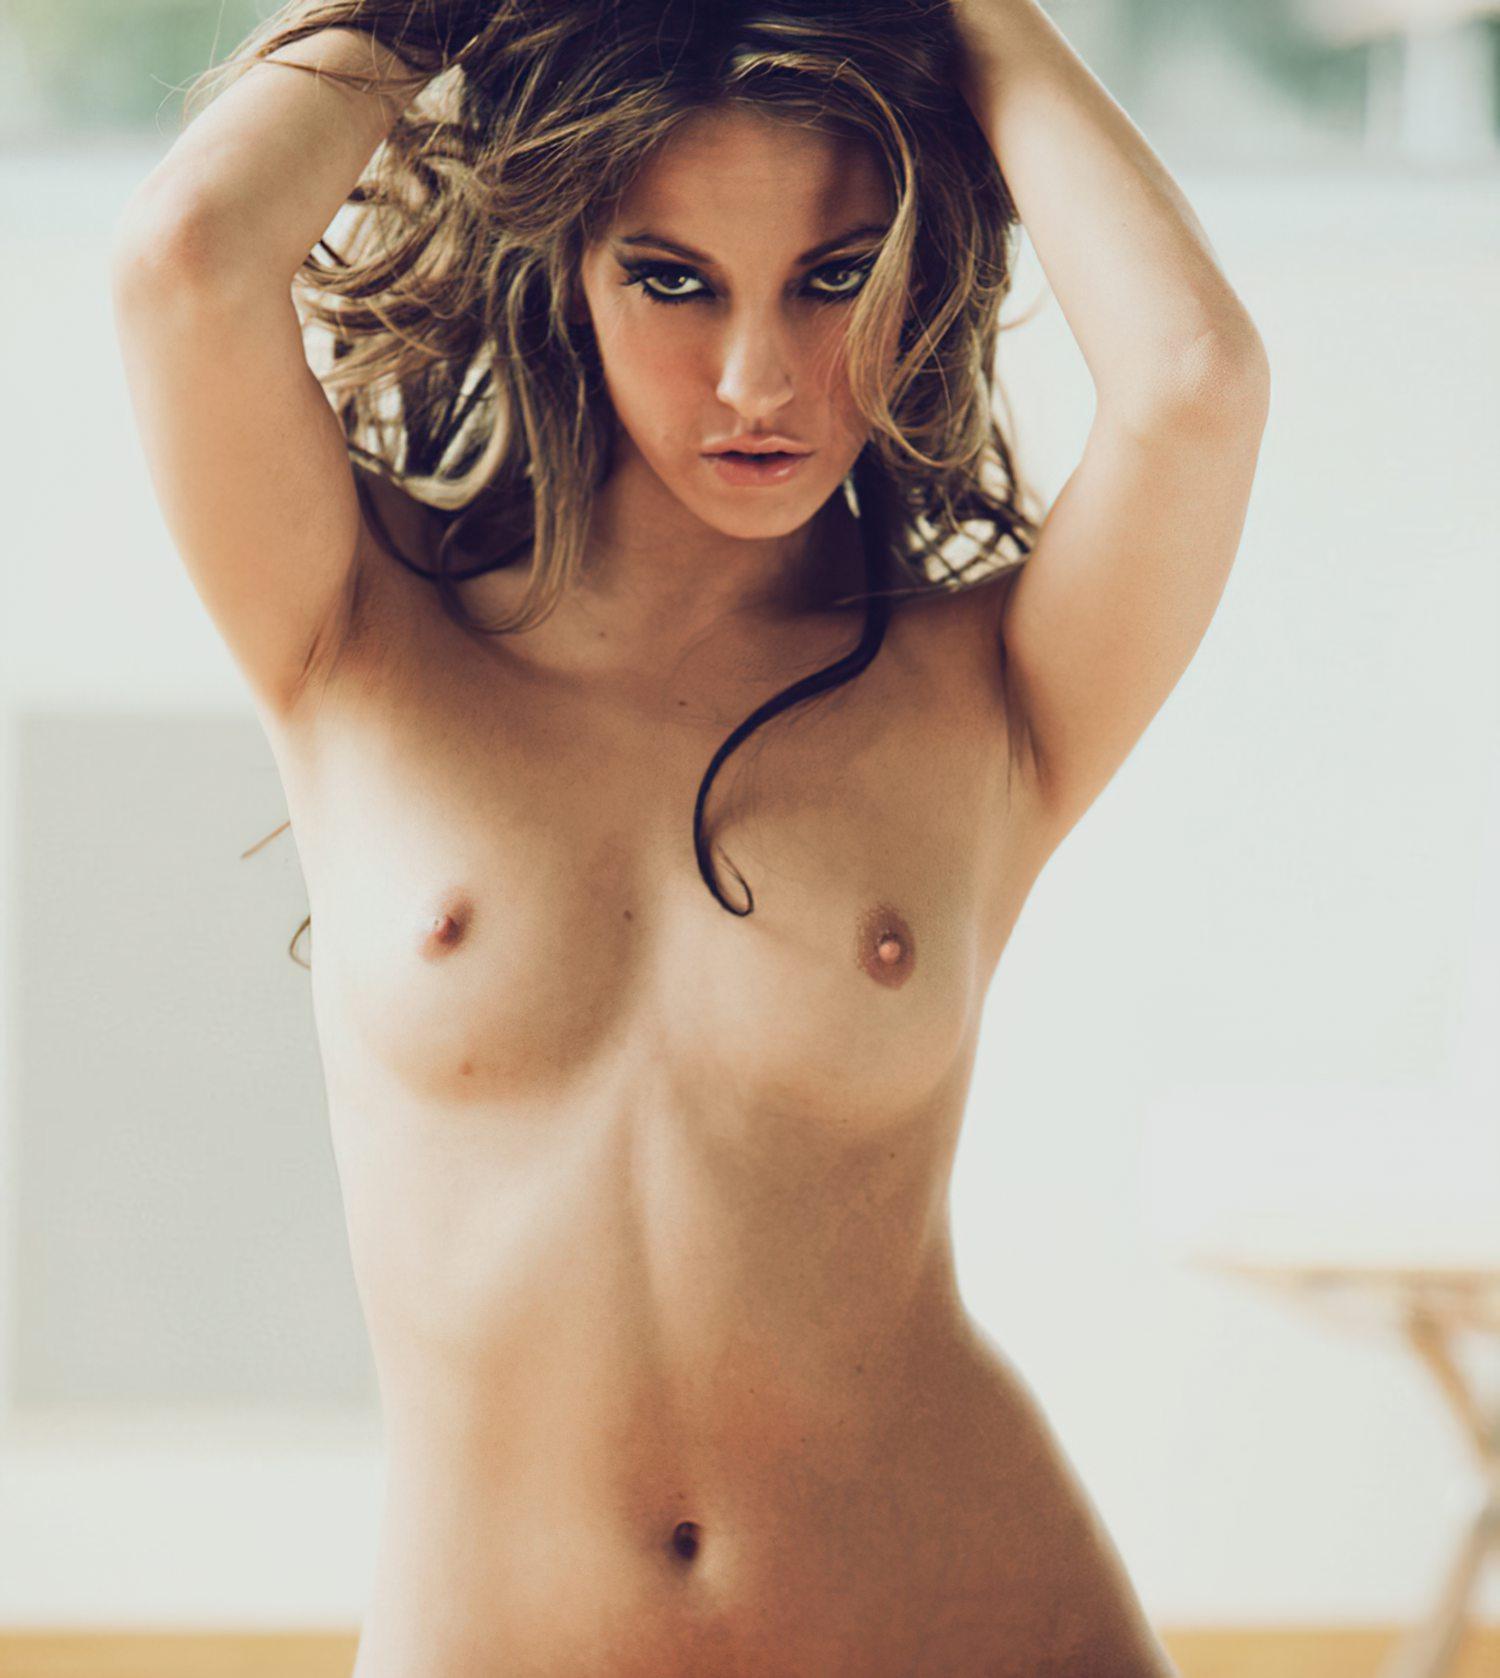 Modelo Jenna Haze (1)